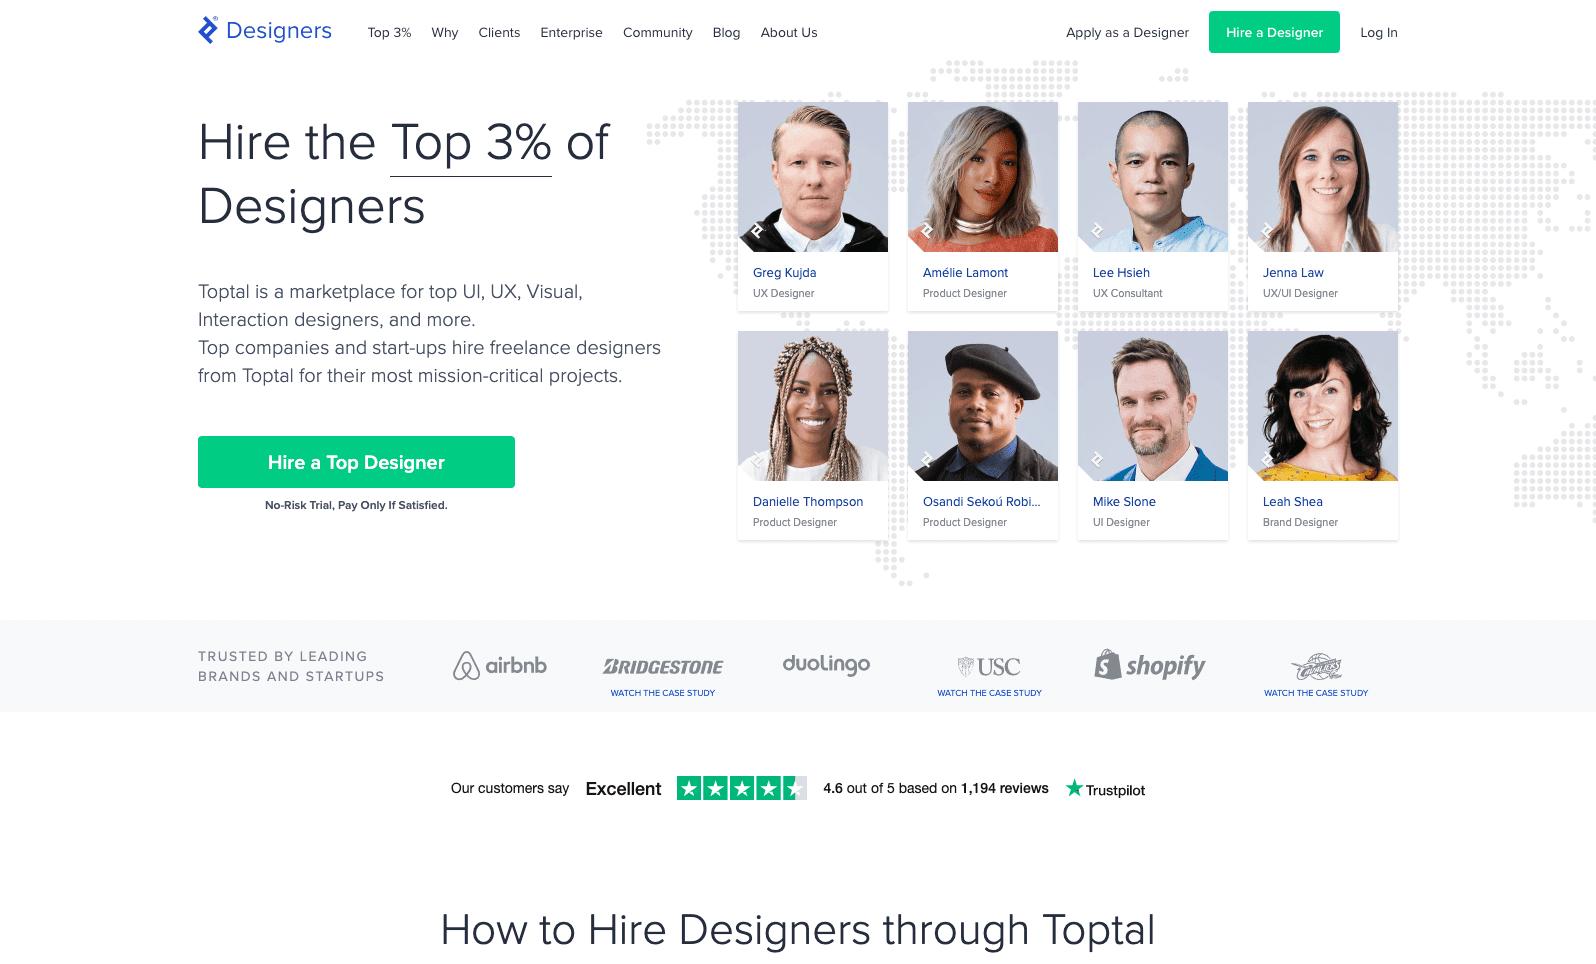 A screenshot of Toptal's website